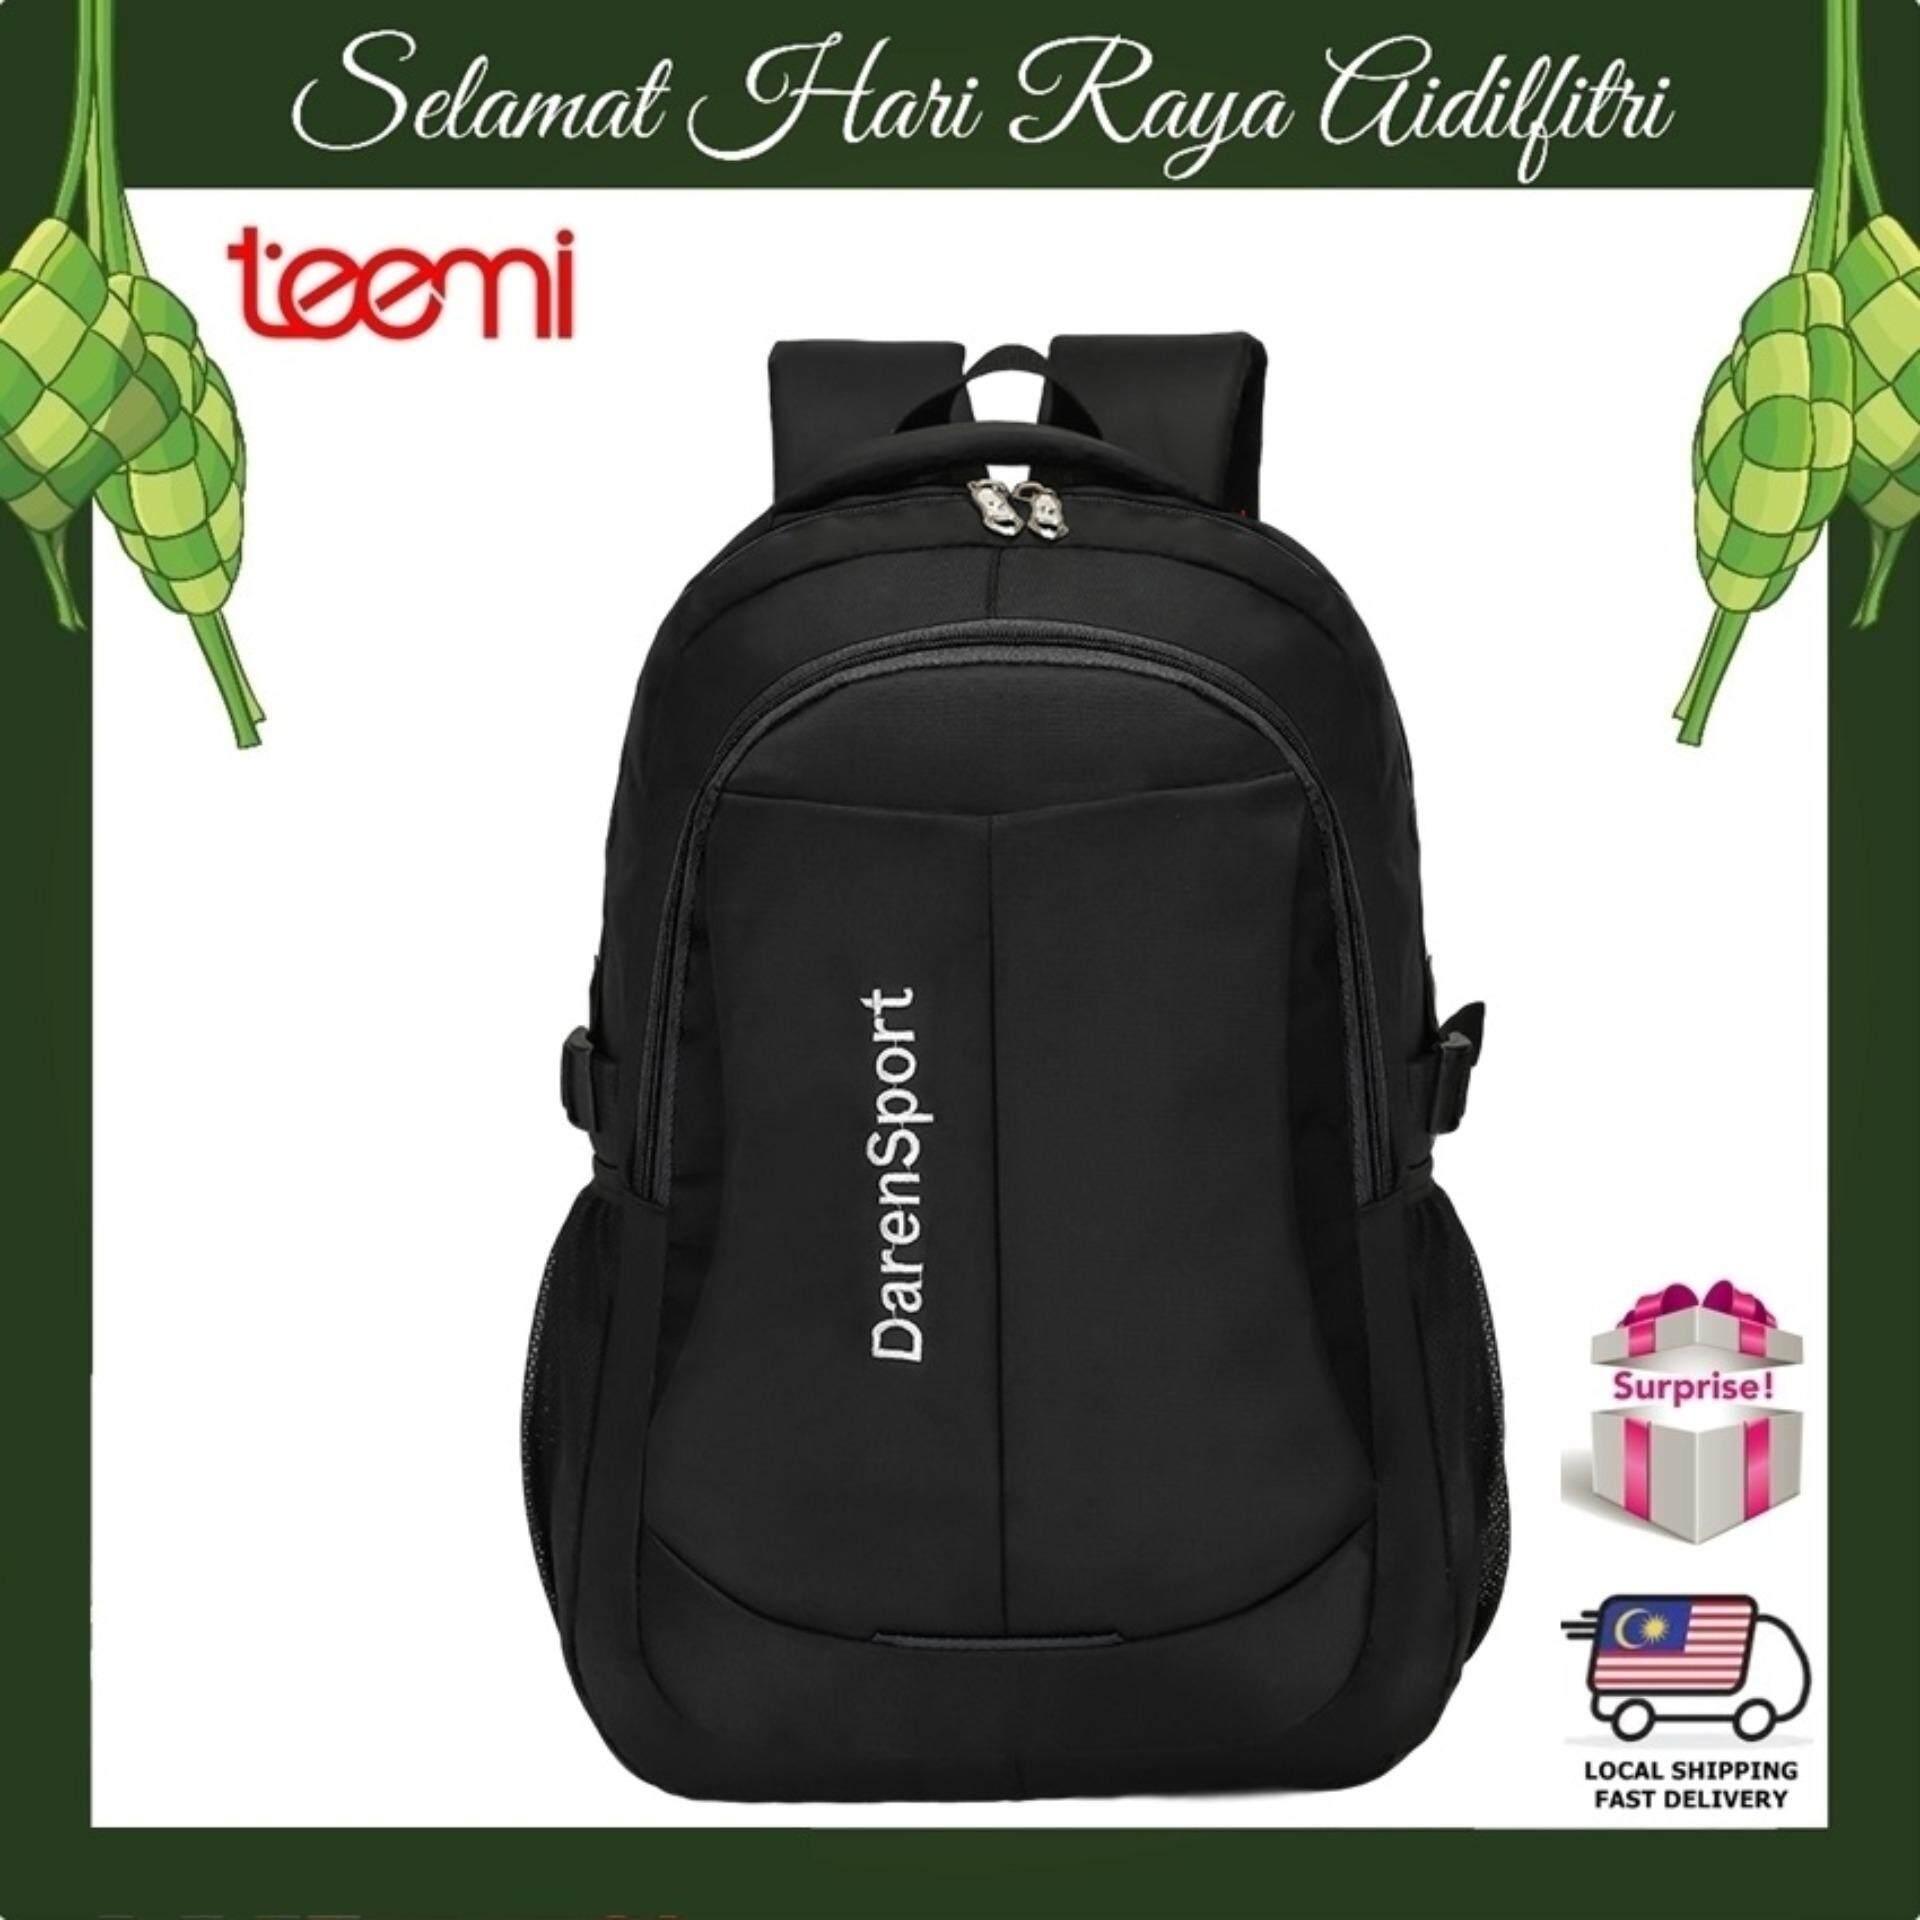 TEEMI Unisex 14 Inch Laptop Backpack Men Women Highlight Travel Business College Teenager Student School Bag Sports Day Pack - Black